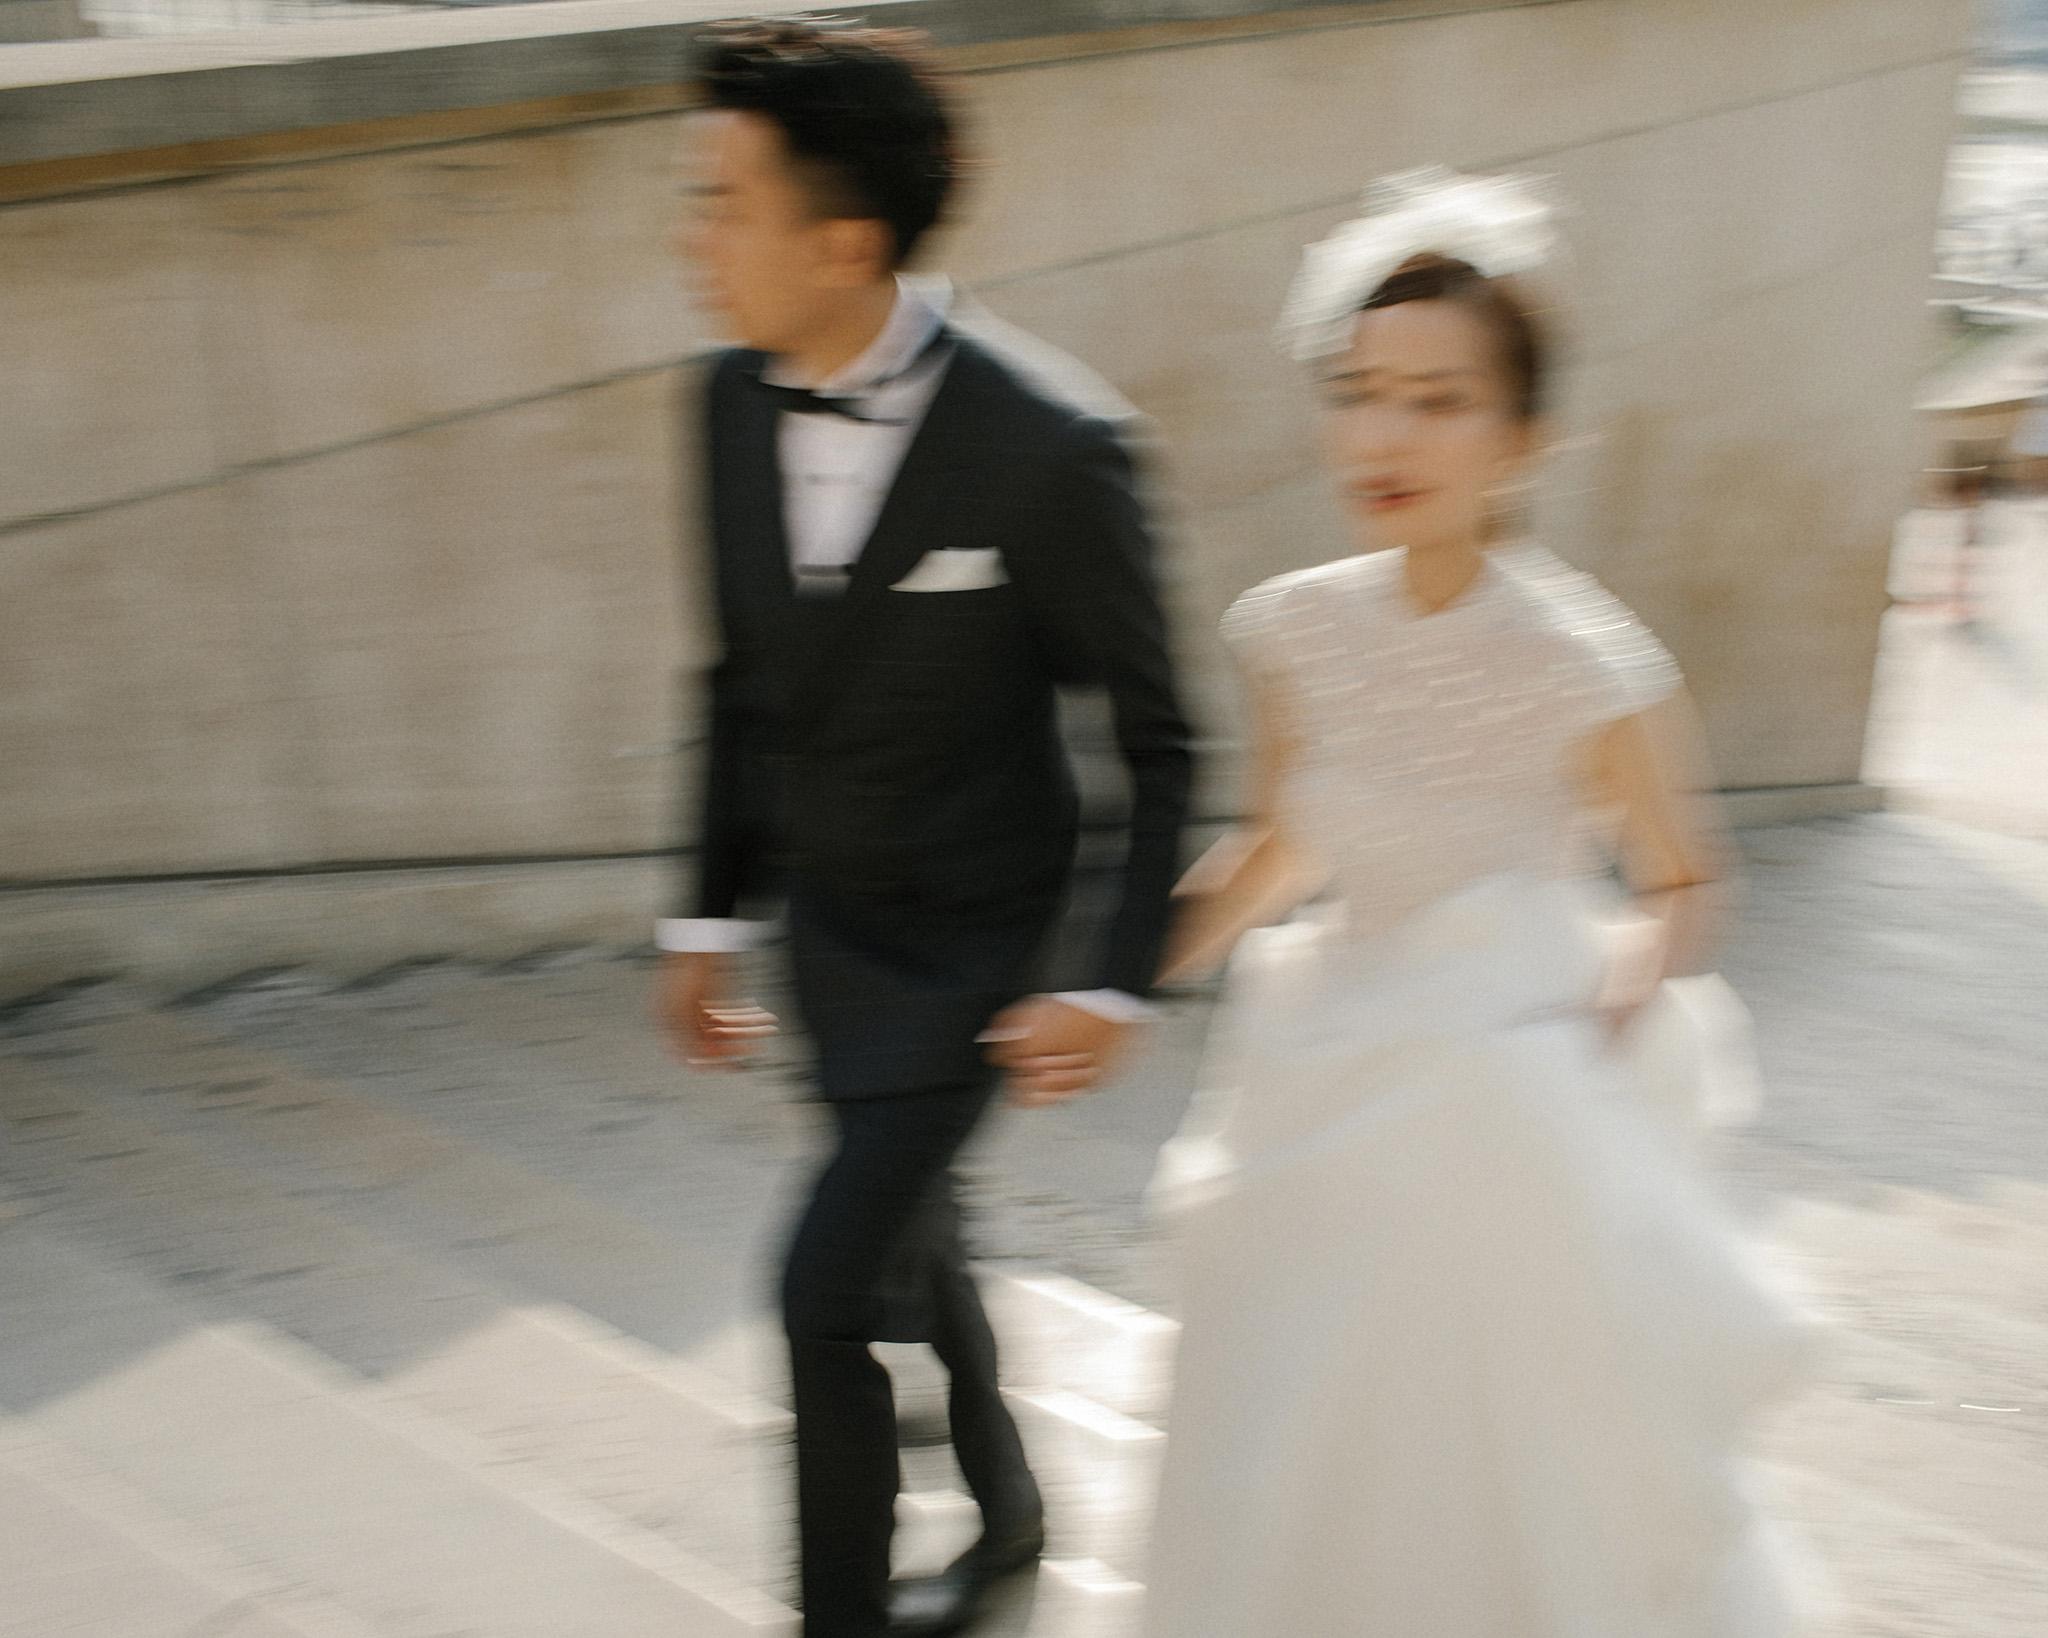 Bride wearing an oscar de la renta dress with a cape